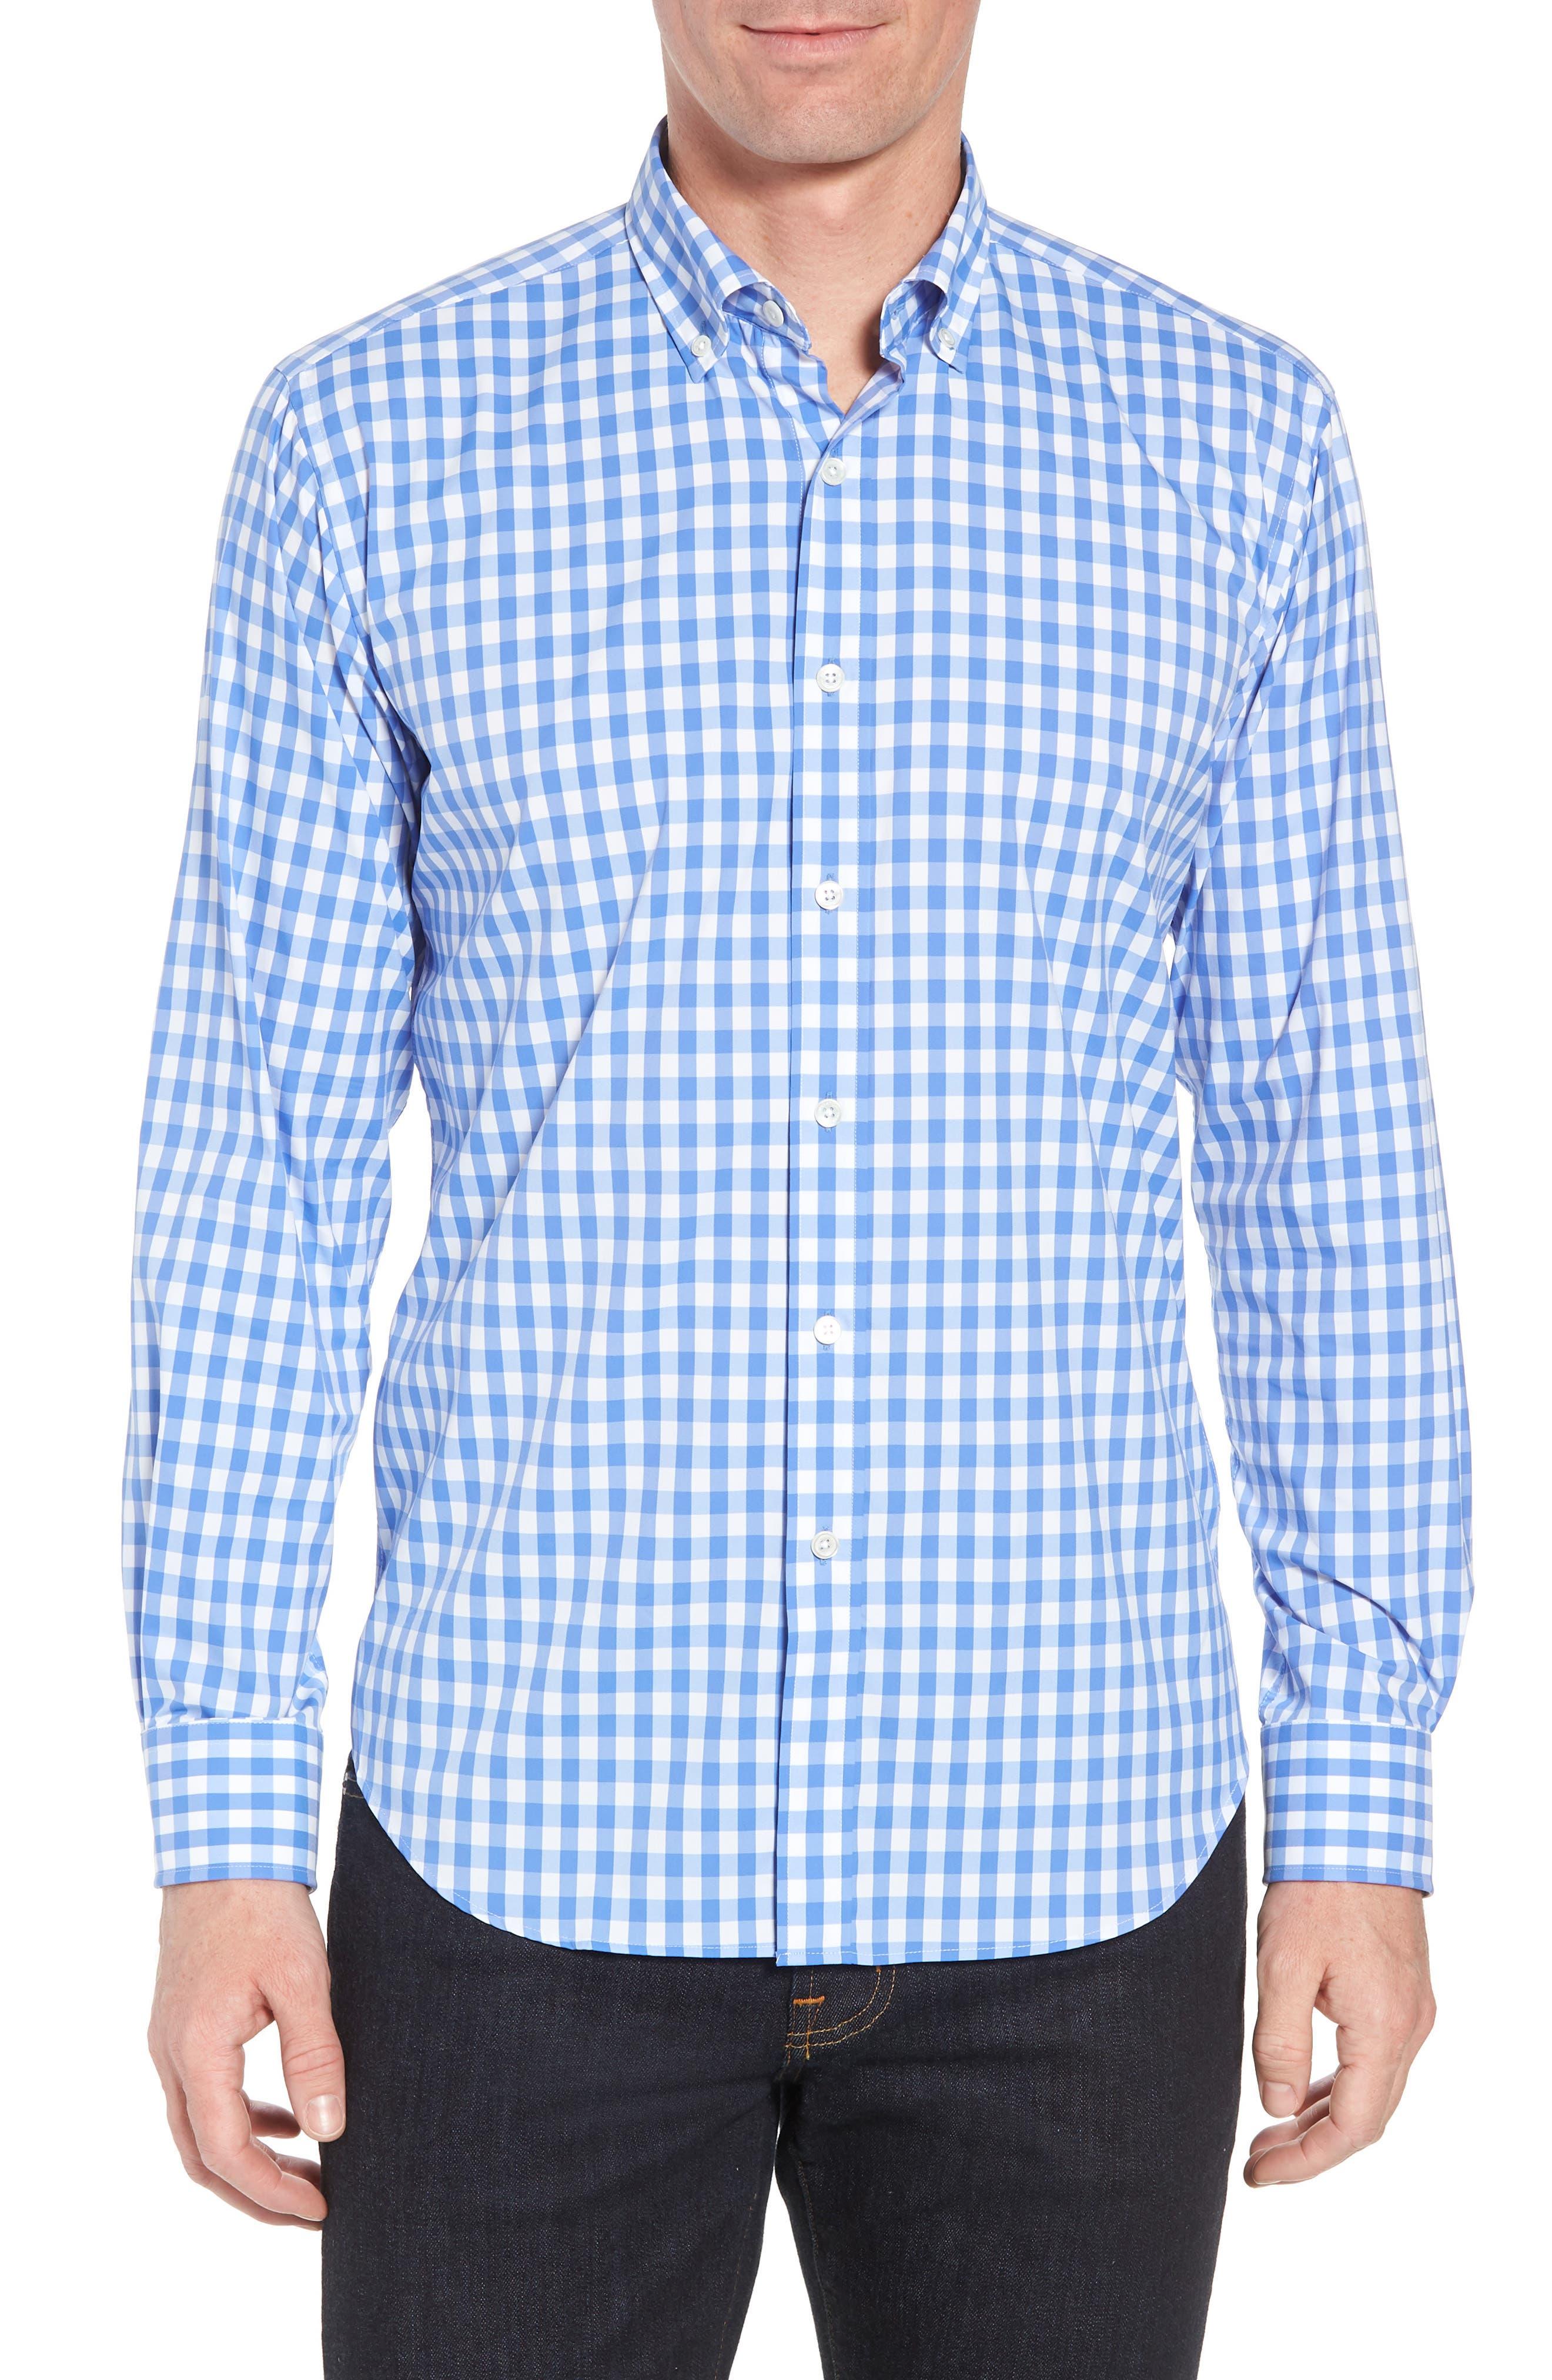 BUGATCHI,                             Shaped Fit Gingham Sport Shirt,                             Main thumbnail 1, color,                             422